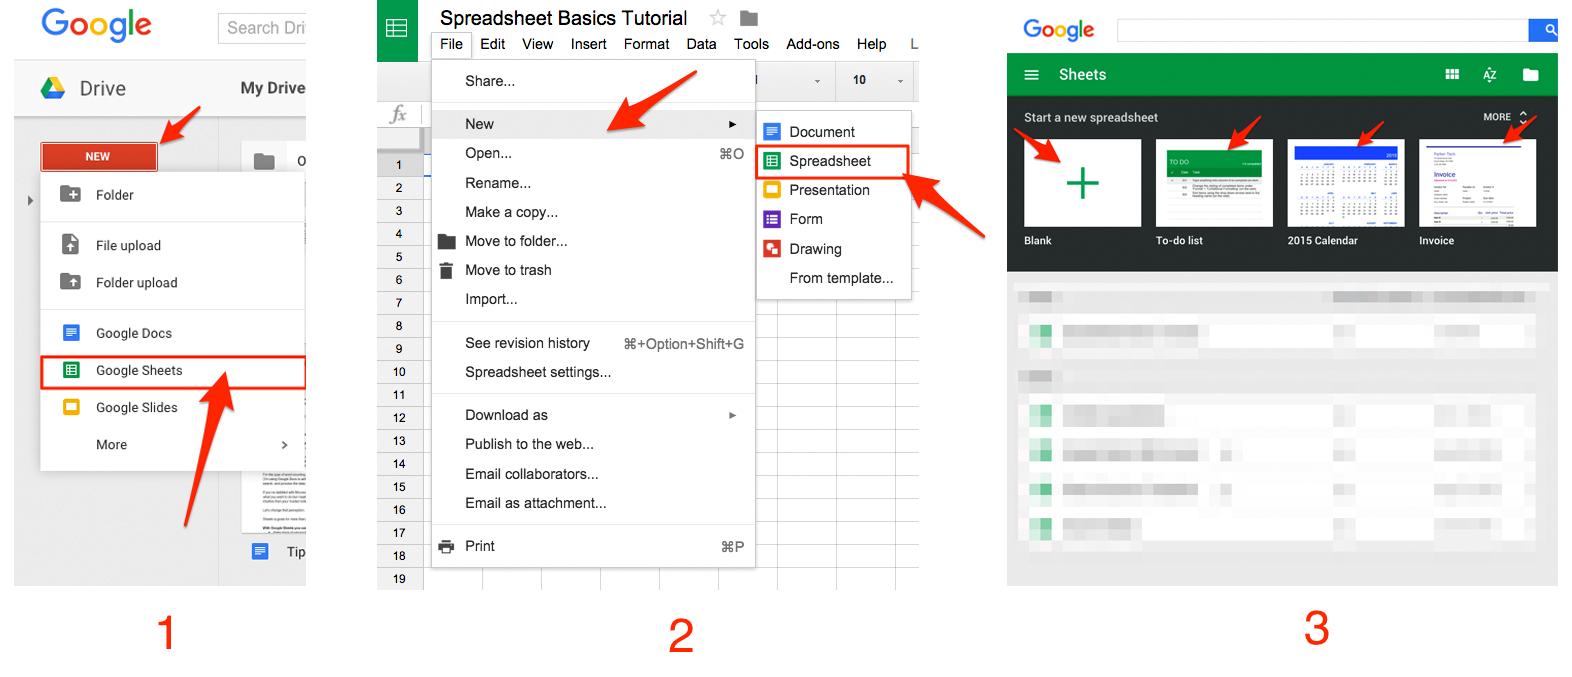 Online Spreadsheet Tools Throughout Google Sheets 101: The Beginner's Guide To Online Spreadsheets  The